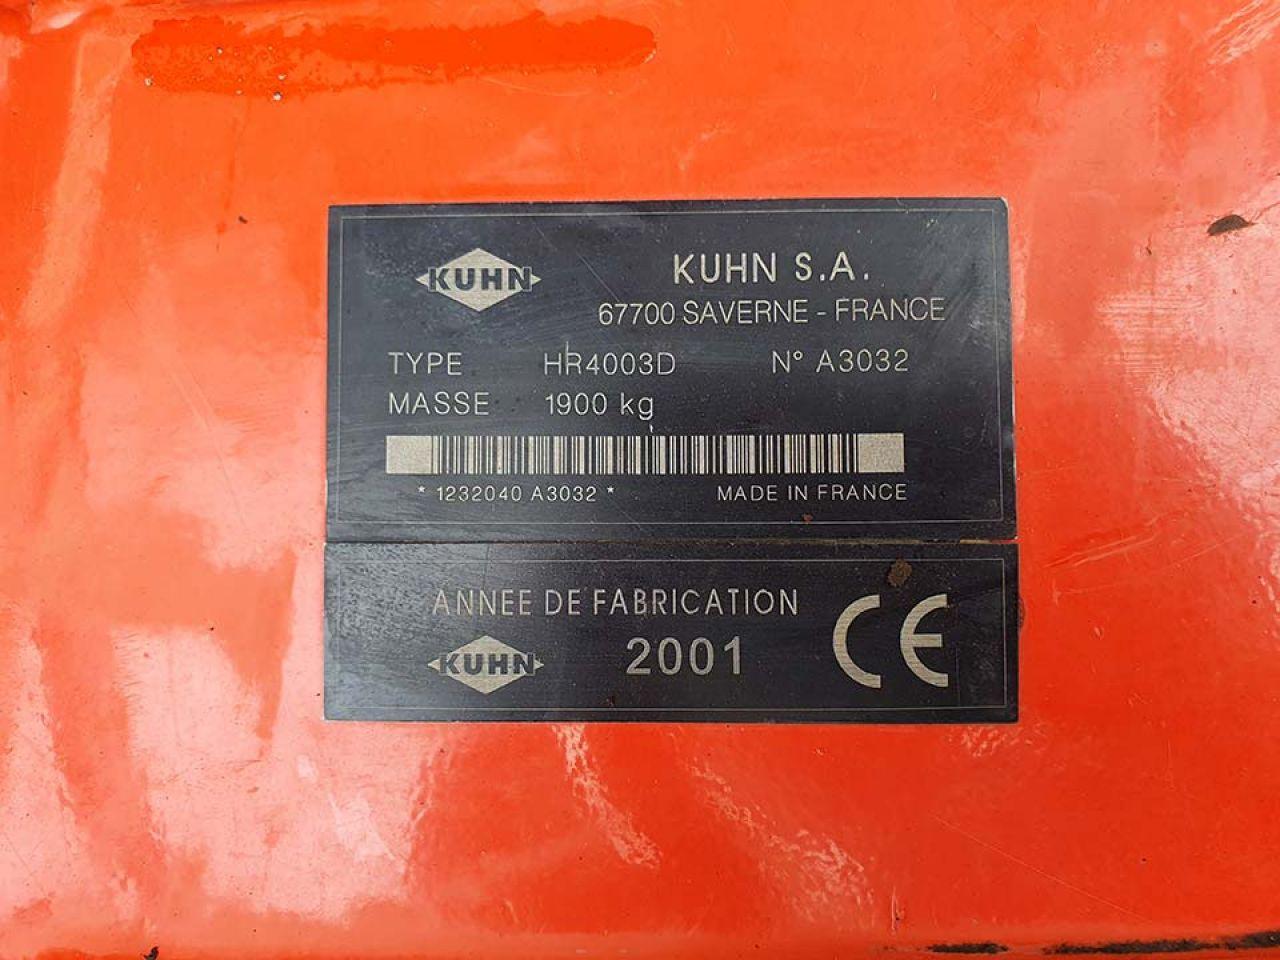 KUHN HR4003D & VENTA LC402 COMBI DRILL